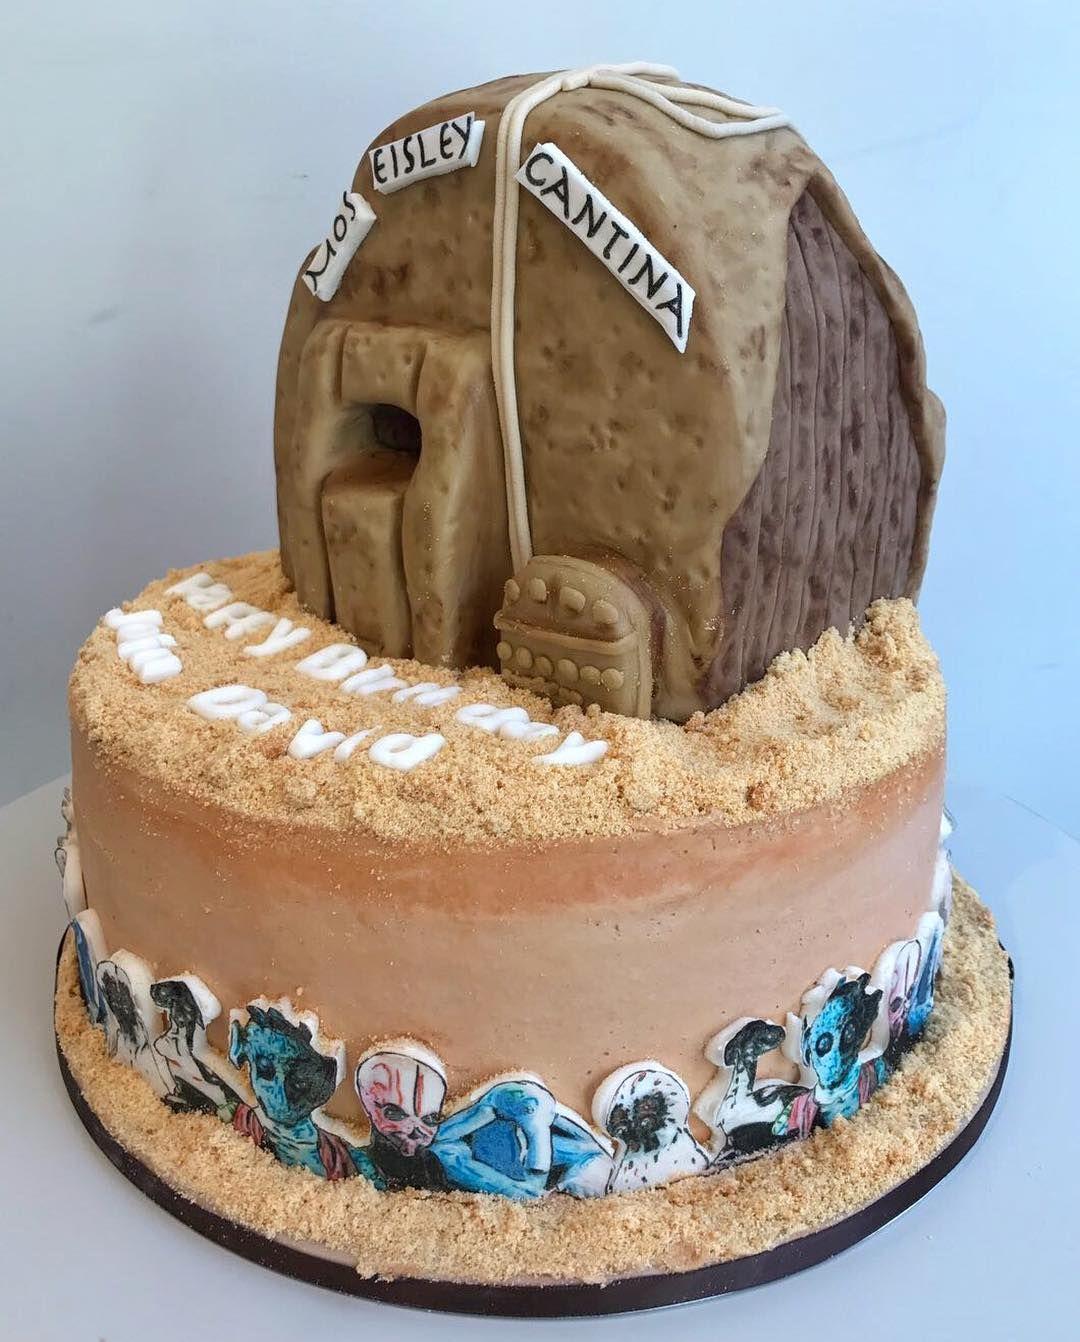 Swell Happy Birthday John David Cake Birthday Birthdaycake Starwars Funny Birthday Cards Online Kookostrdamsfinfo